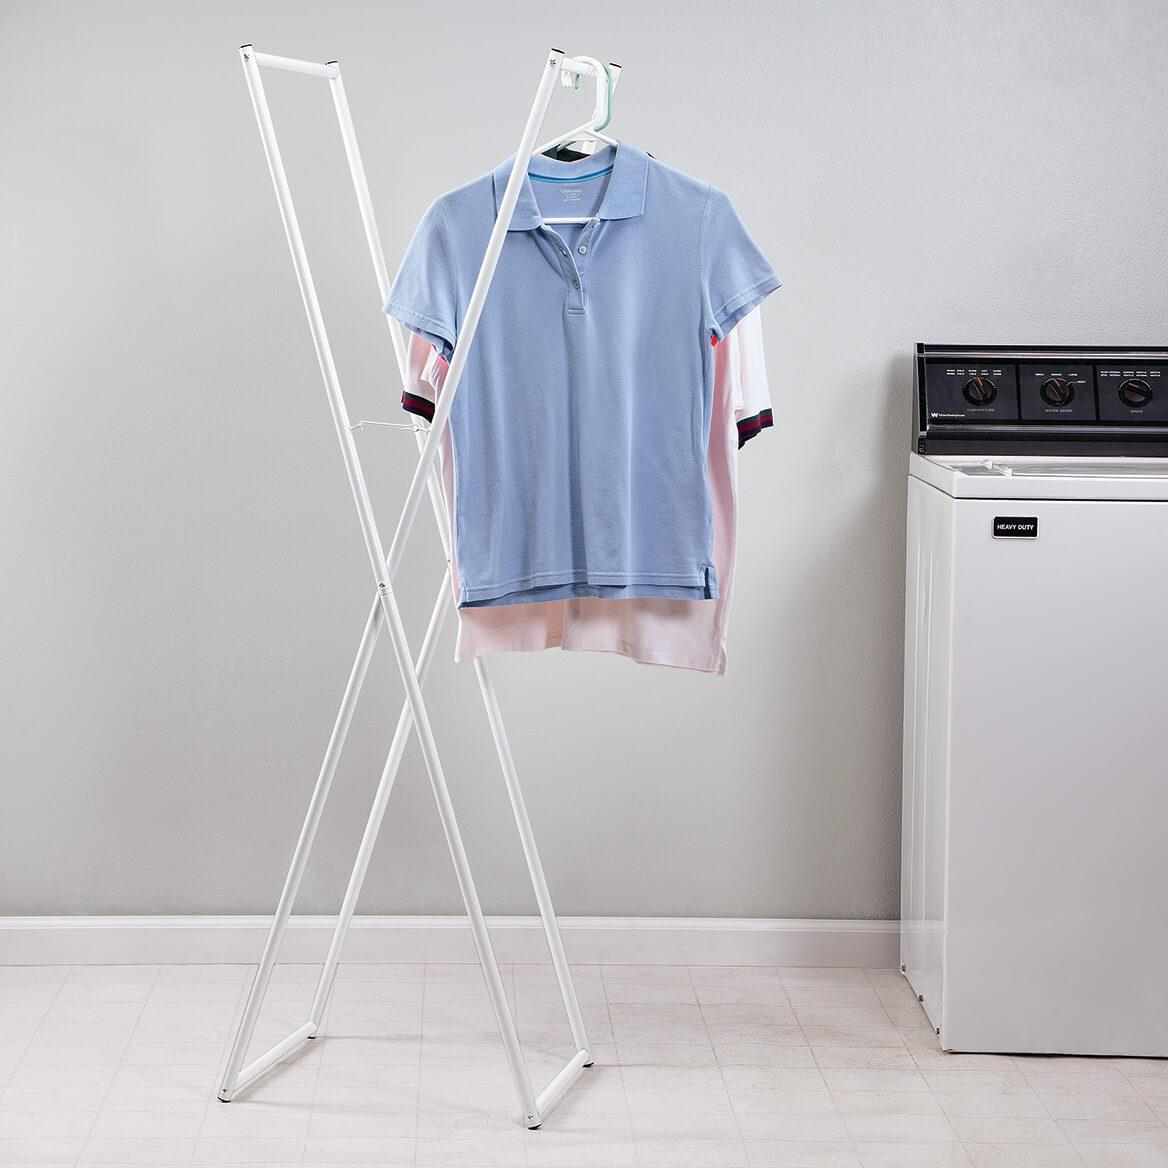 Folding Clothes Rack Clothing Hanging Racks Miles Kimball